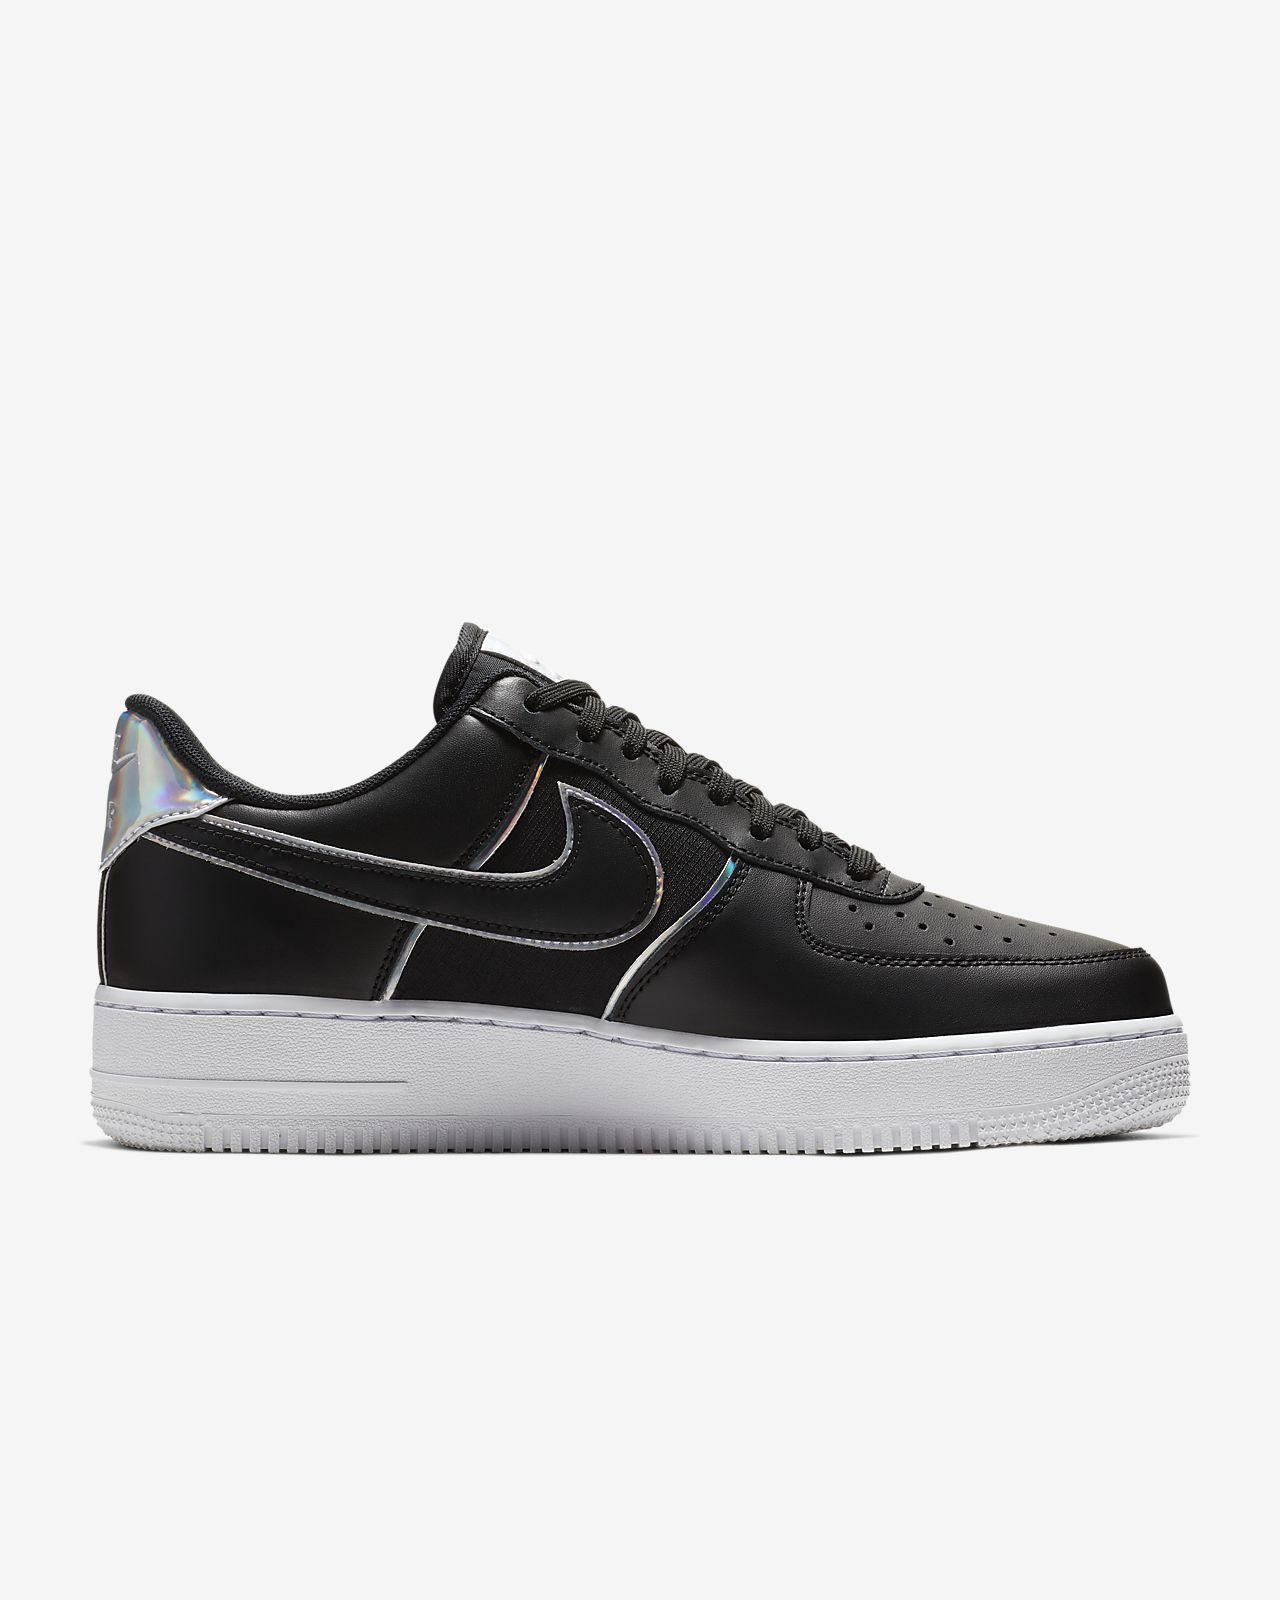 innovative design 51dcf d1c0f ... Nike Air Force 1  07 LV8 4 Men s Shoe